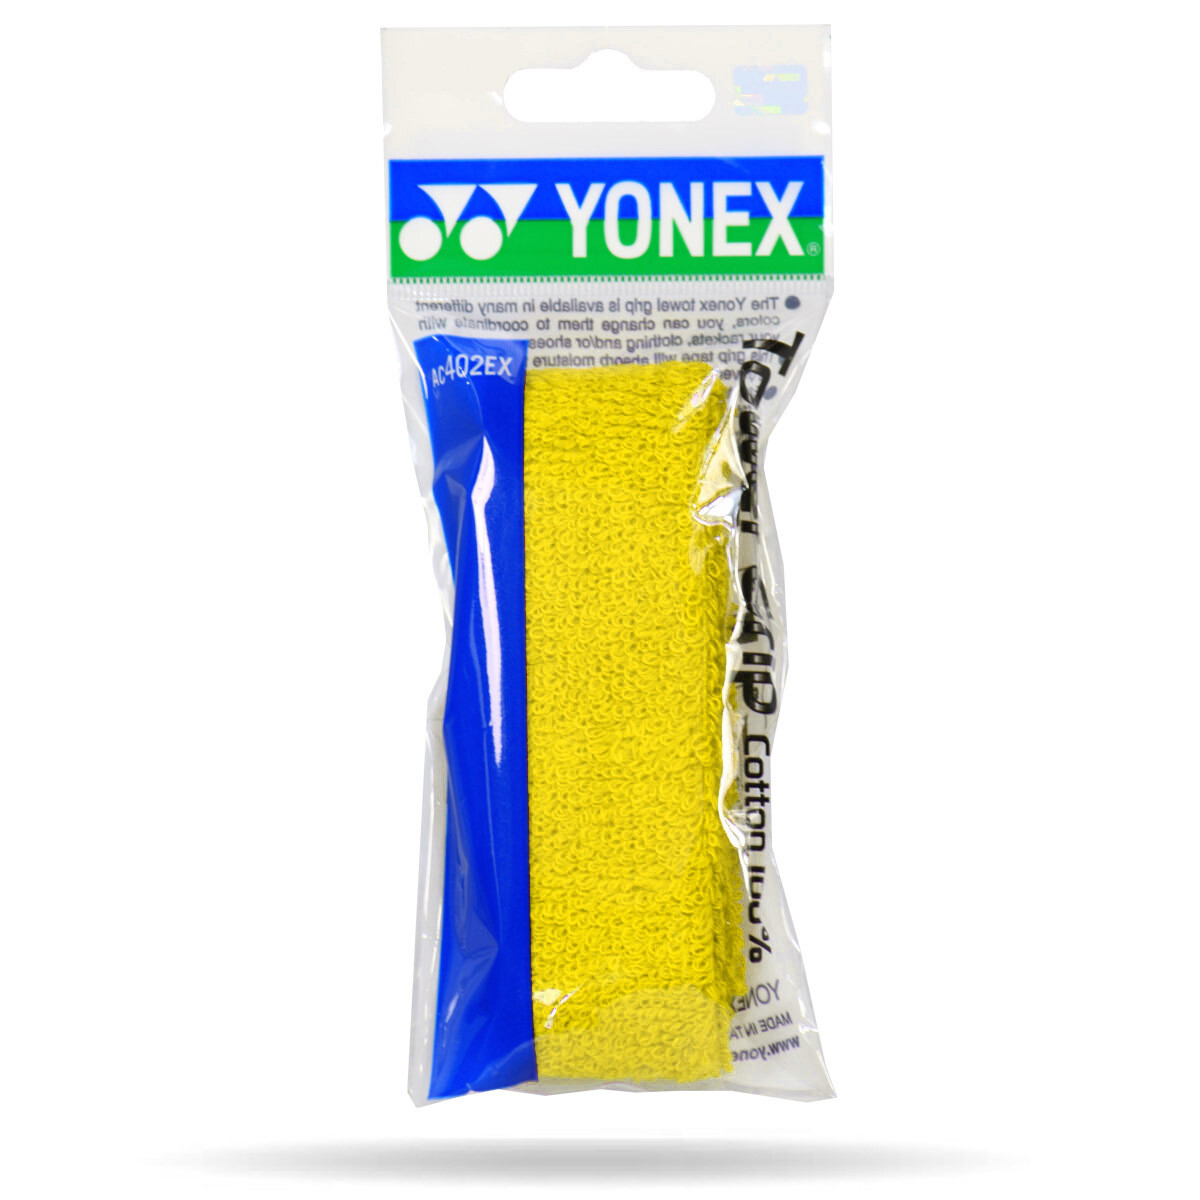 Yonex Towel Grip - Yellow